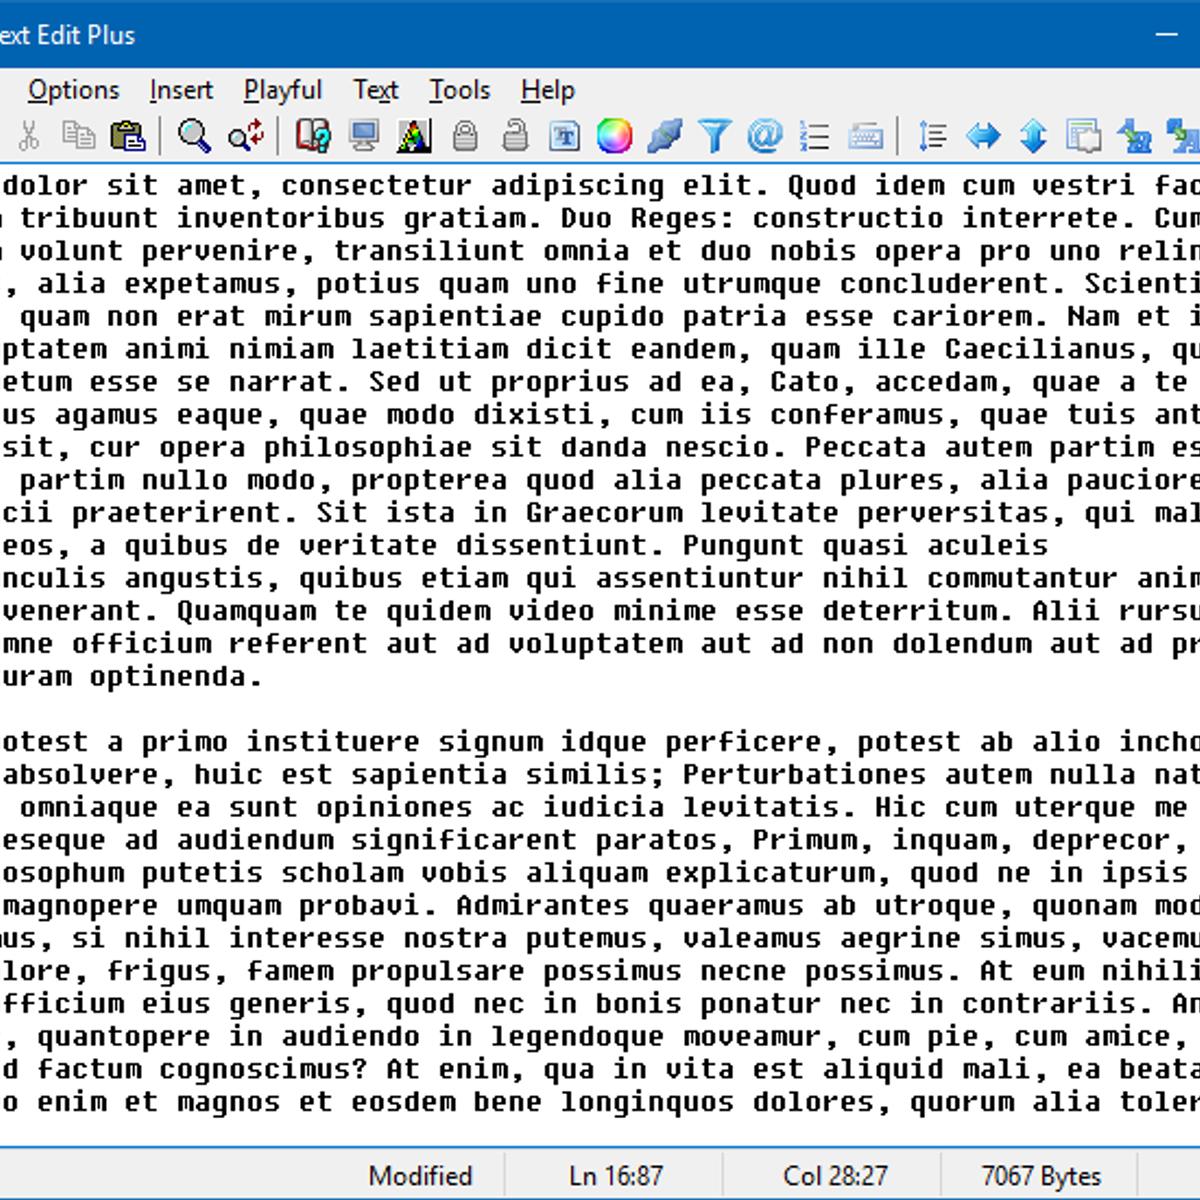 Text Edit Plus Alternatives and Similar Software